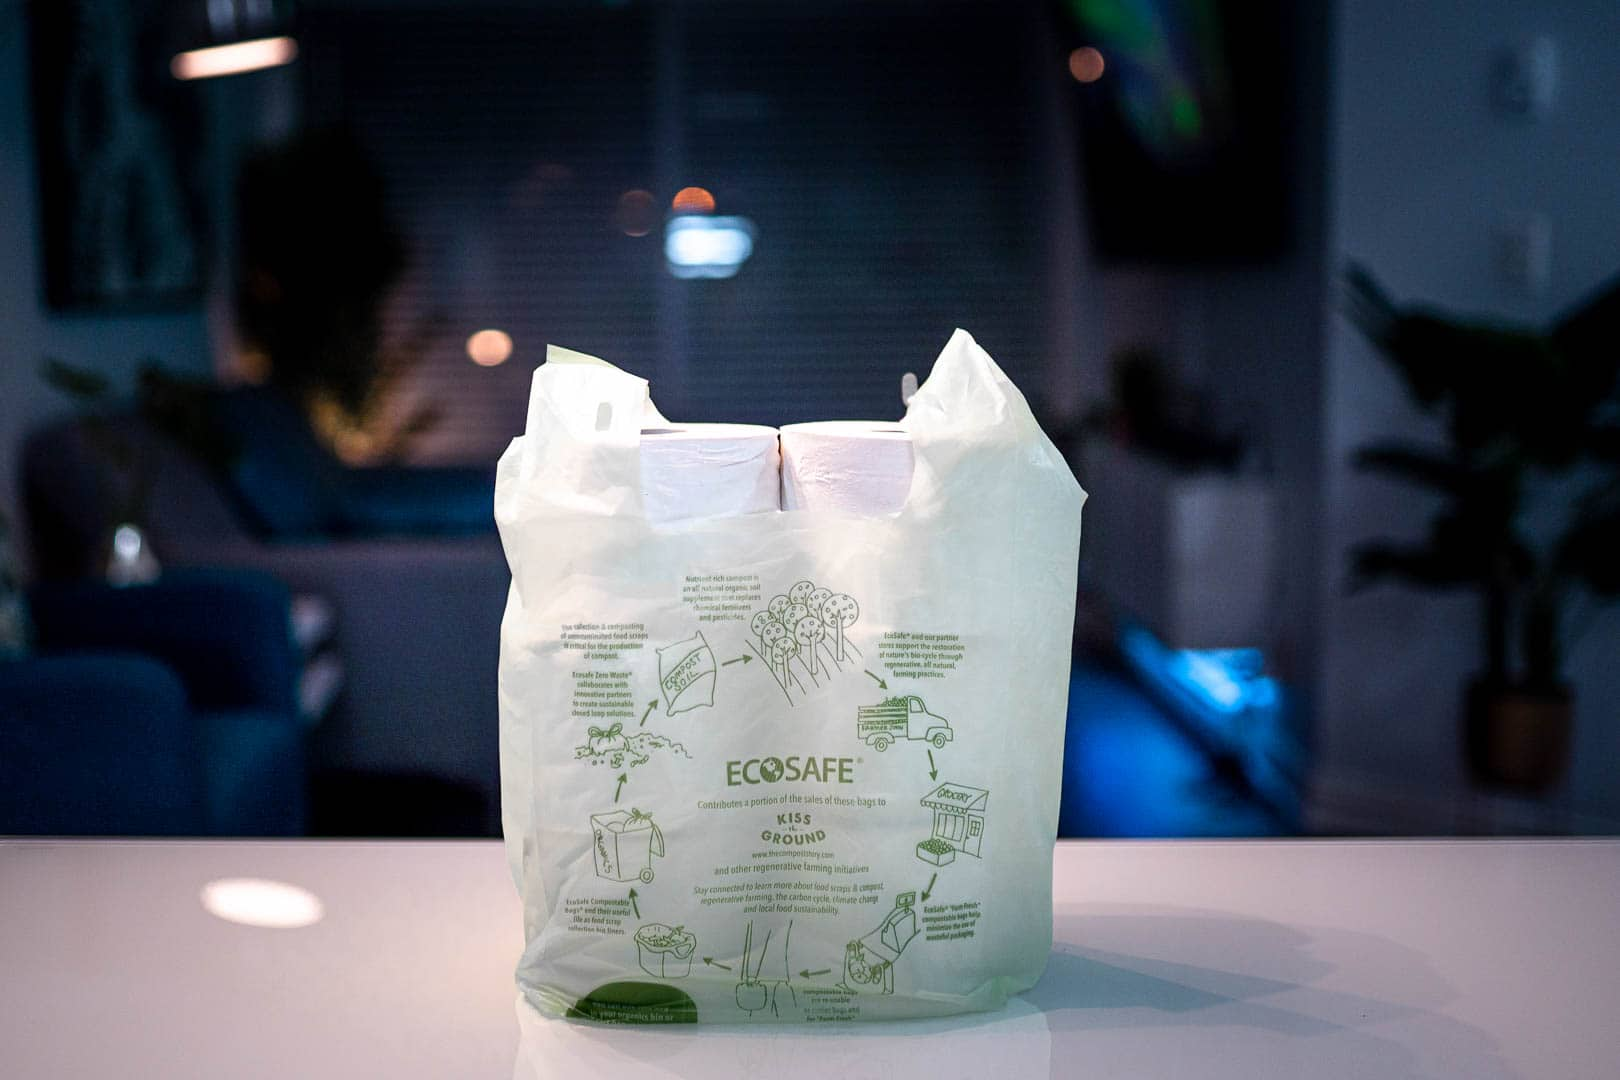 Ecosafe Green | Zero waste - toilet paper in plastic bag